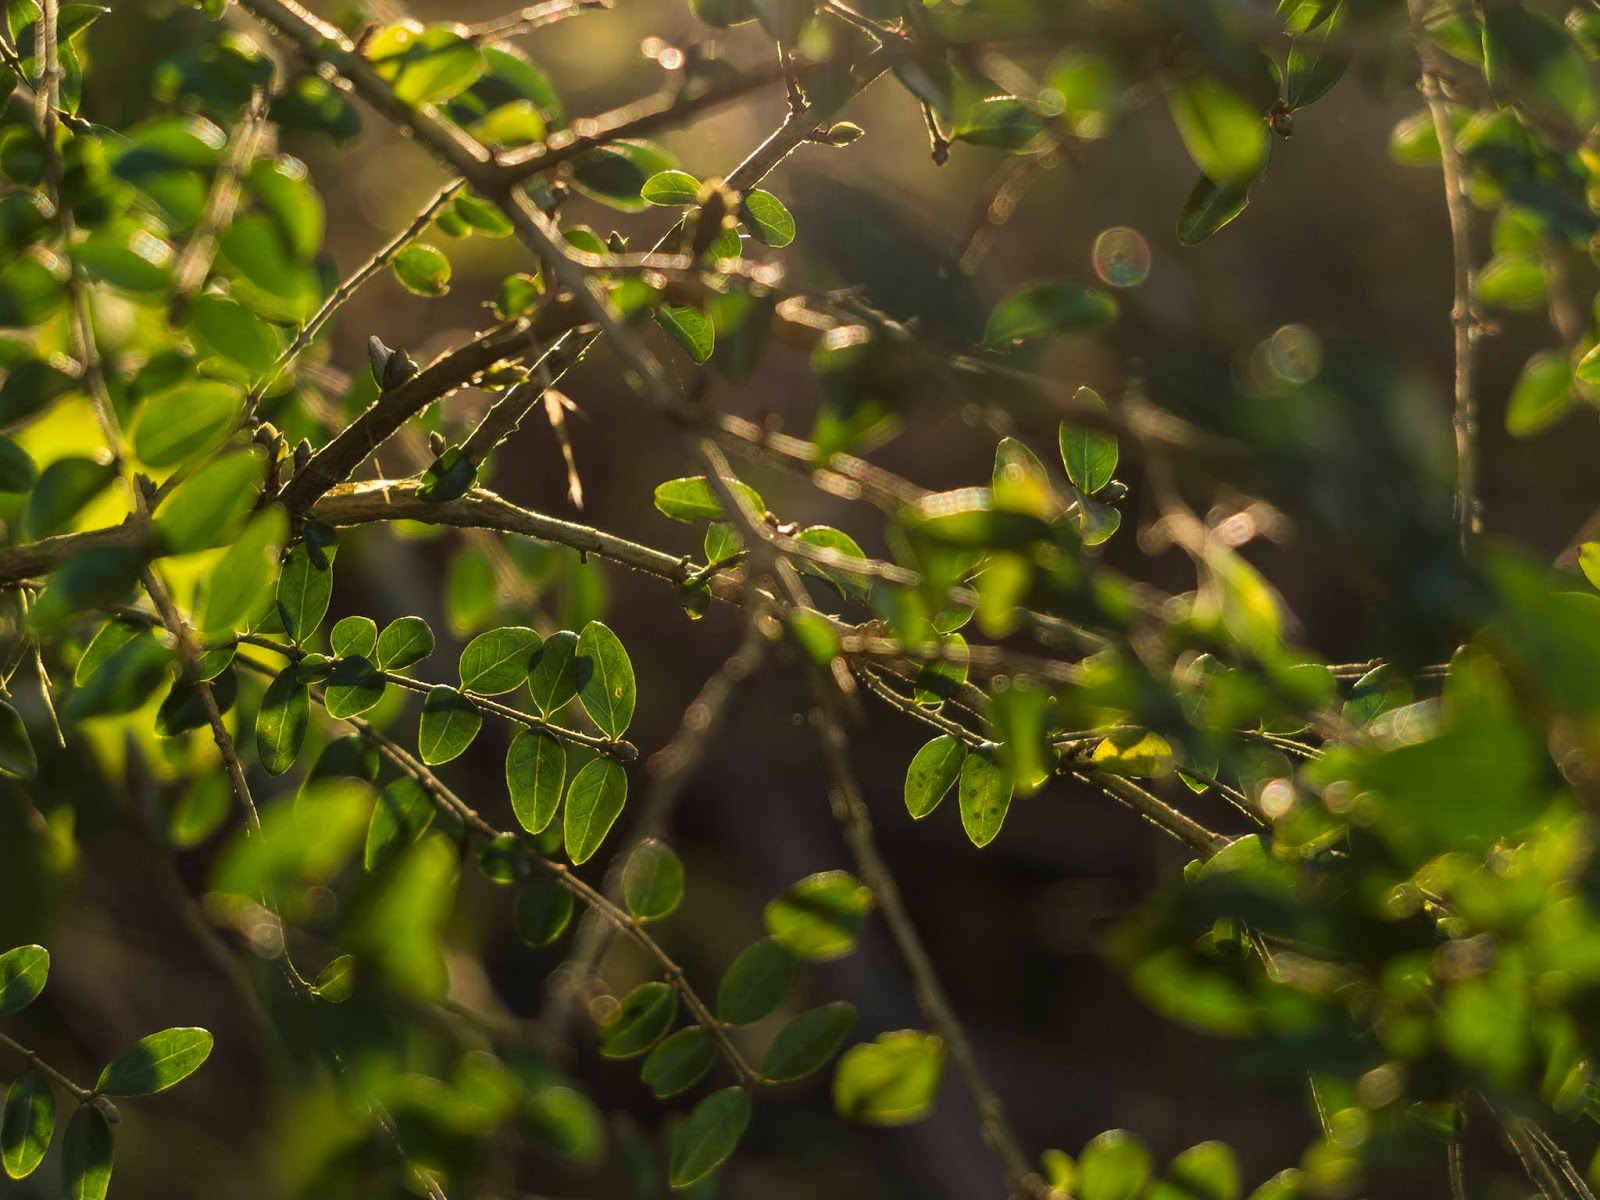 Sunset light shining though tiny evergreen leaves.